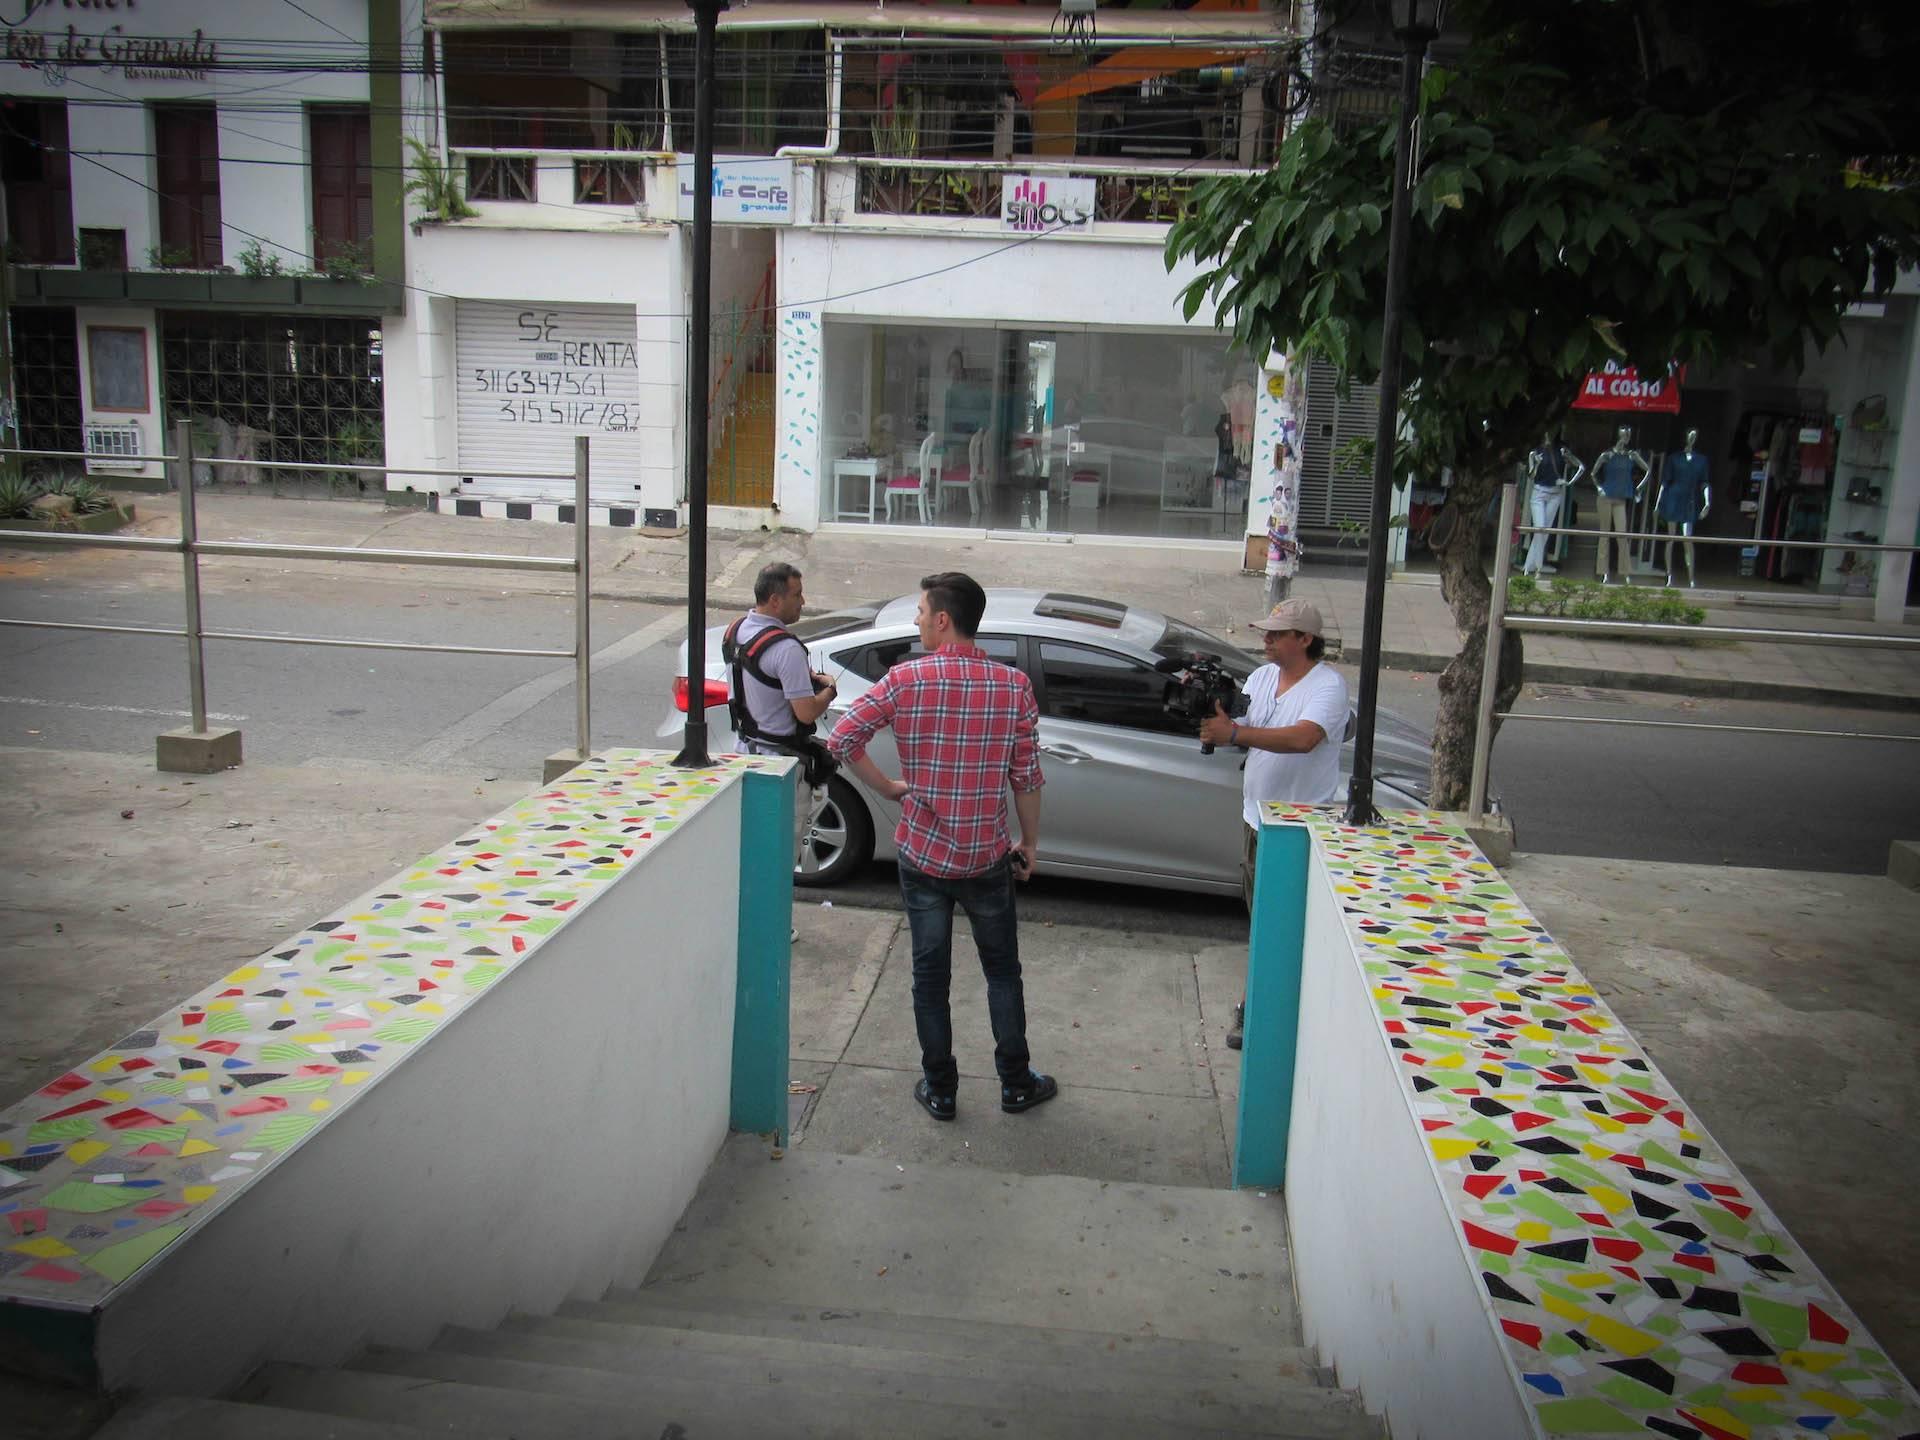 mgid:file:gsp:scenic:/international/mtvla.com/catfish-colombia/temporada-2/fotogalerias/episodio-209/CATFISHCO_CAPITULO_209_10.jpg